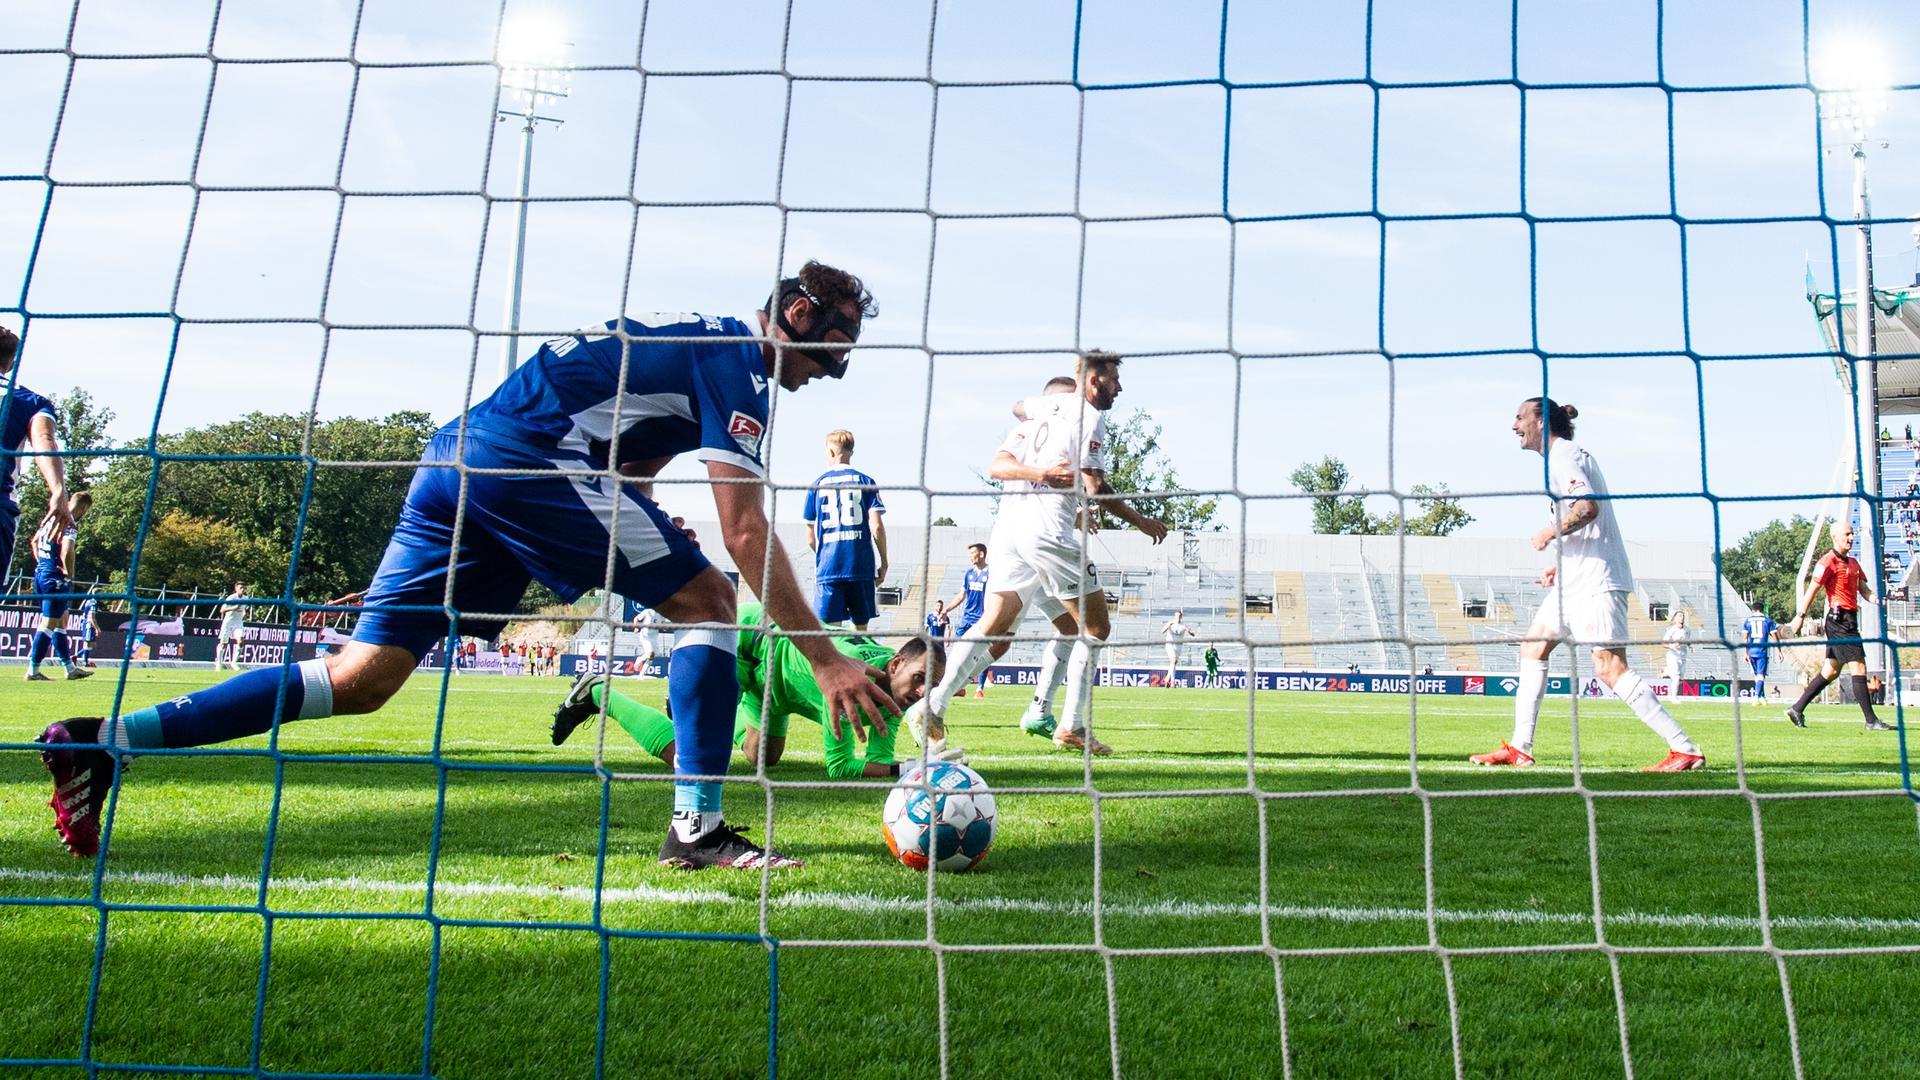 Robin Bormuth (KSC) holt den Ball nach Tor zum 0-3, hinten Torwart Marius Gersbeck (KSC) am Boden und jubelnde Spieler von St. Pauli.  GES/ Fussball/ 2. Bundesliga: Karlsruher SC - FC St. Pauli, 25.09.2021 --  Football/ Soccer 2rd Division: Karlsruher SC vs SC St. Pauli, Karlsruhe, Sep 25, 2021 --